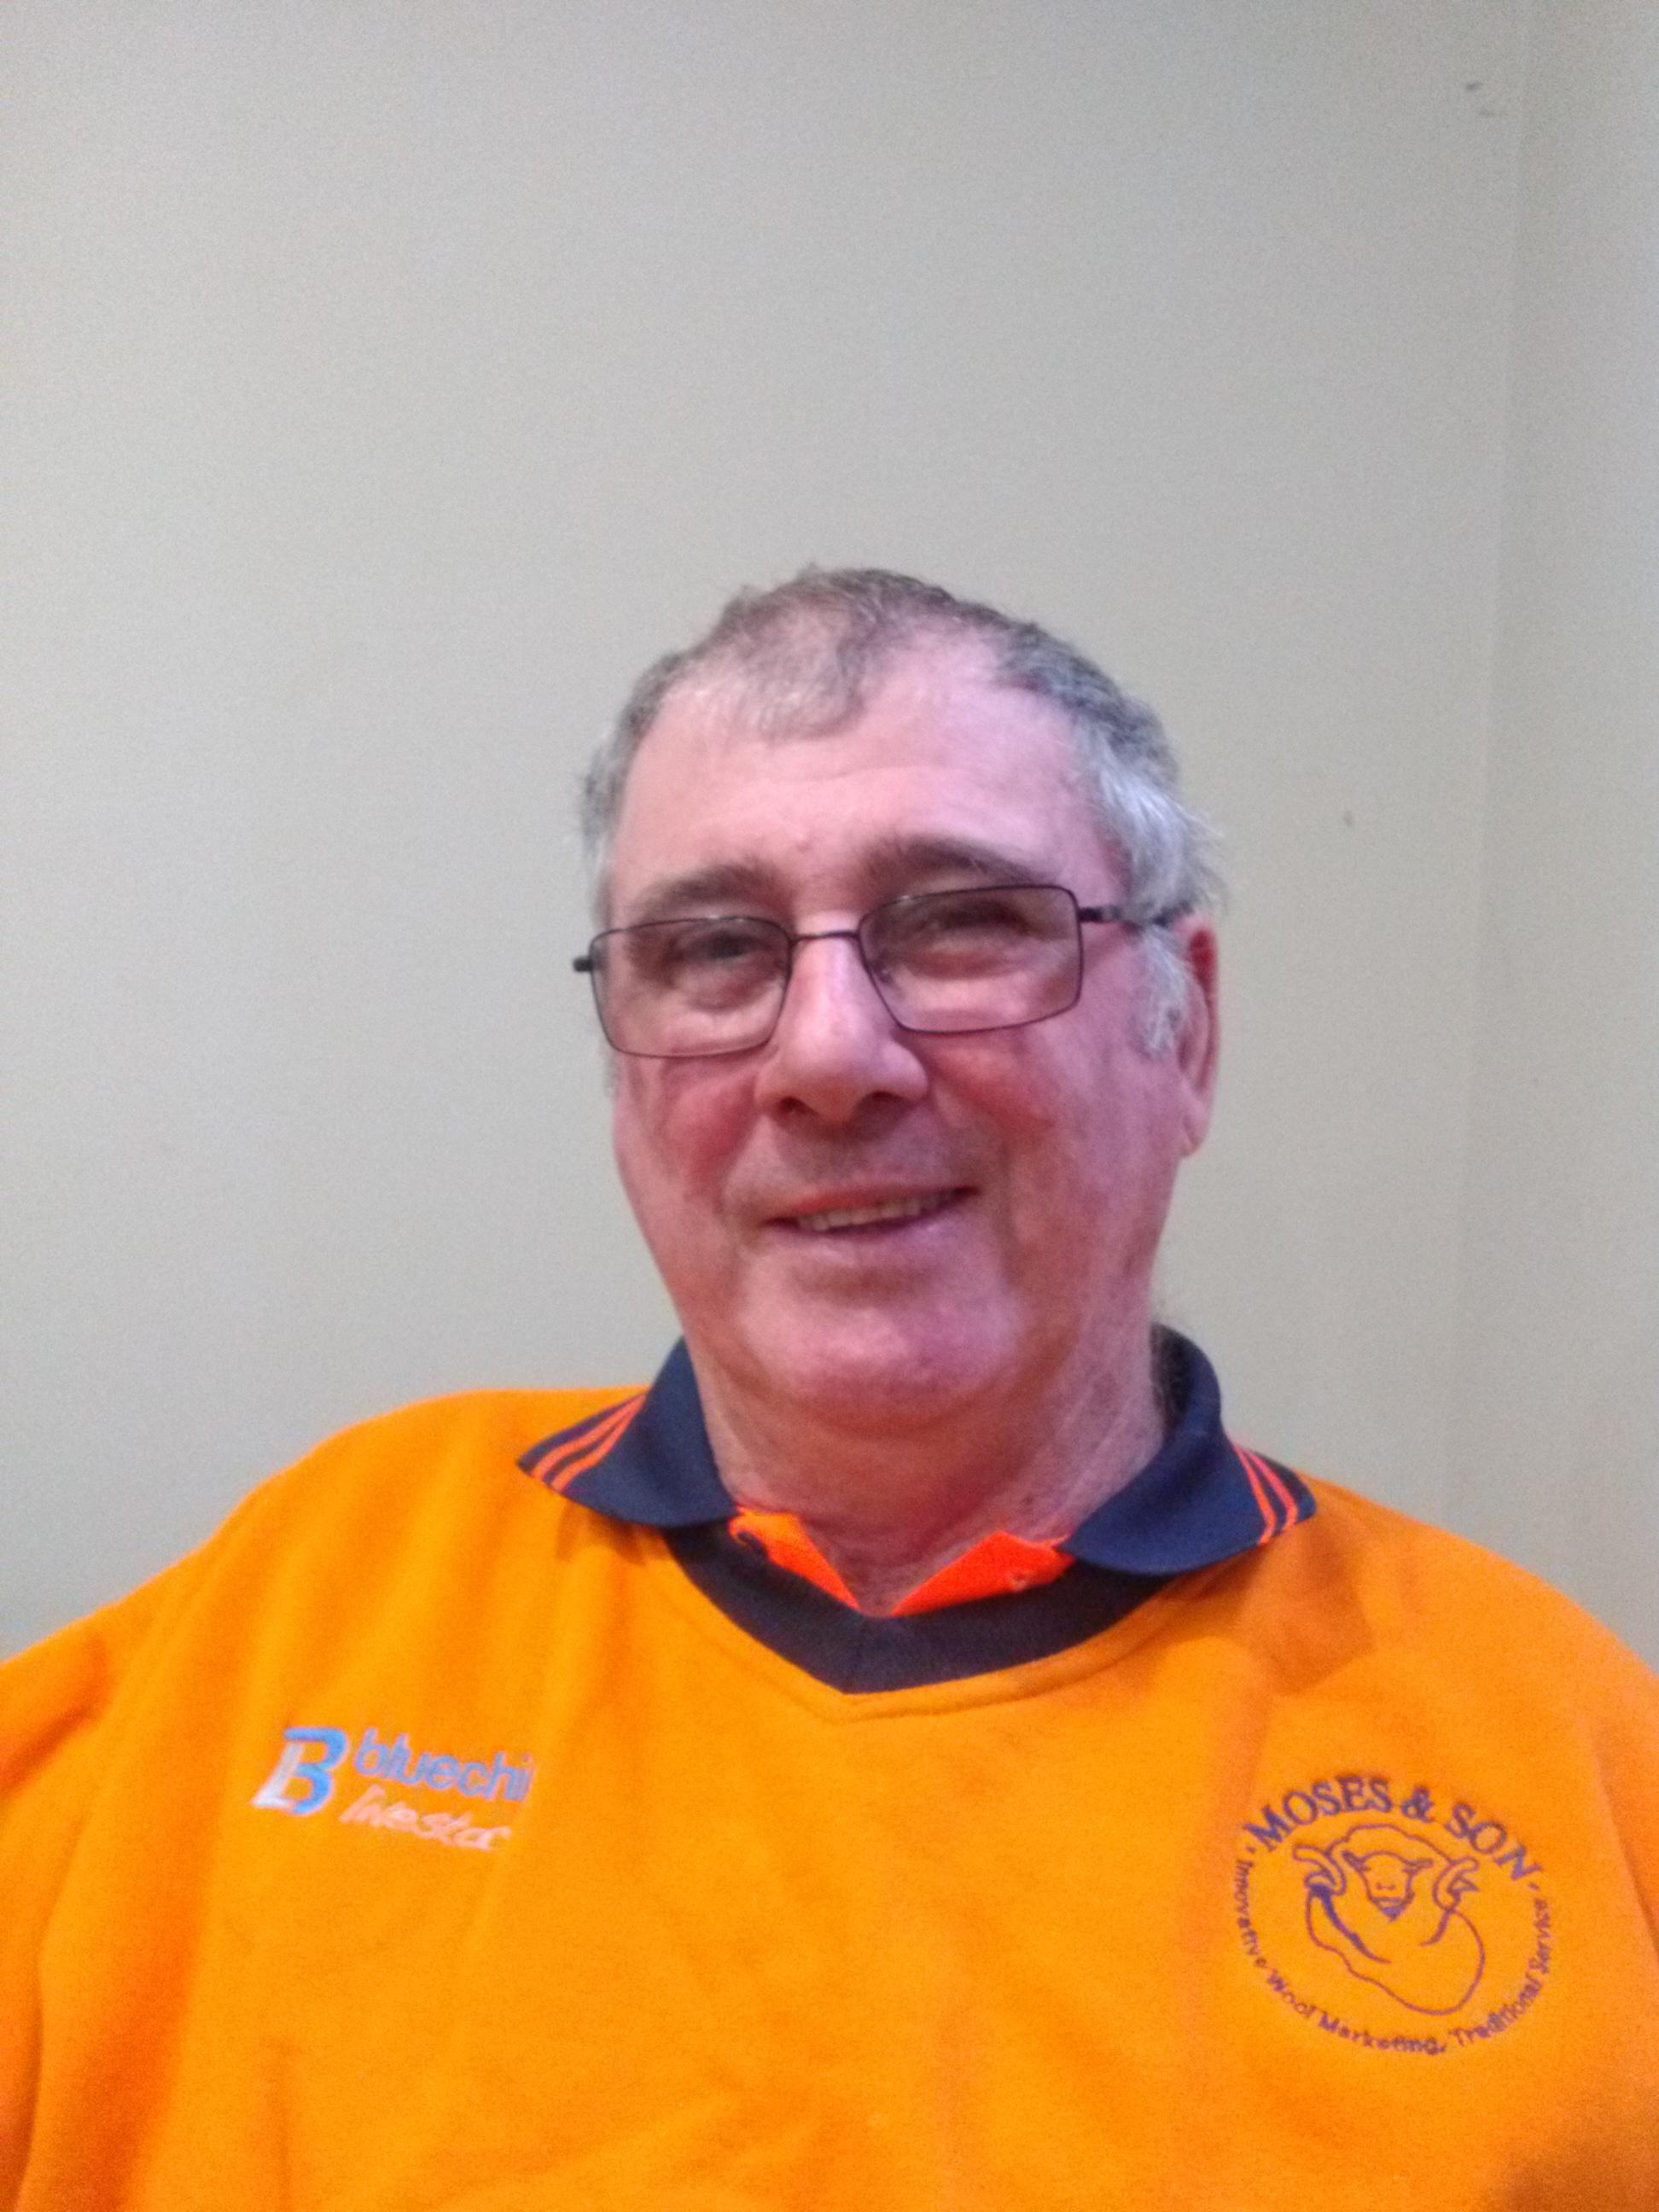 Paddy Reardon